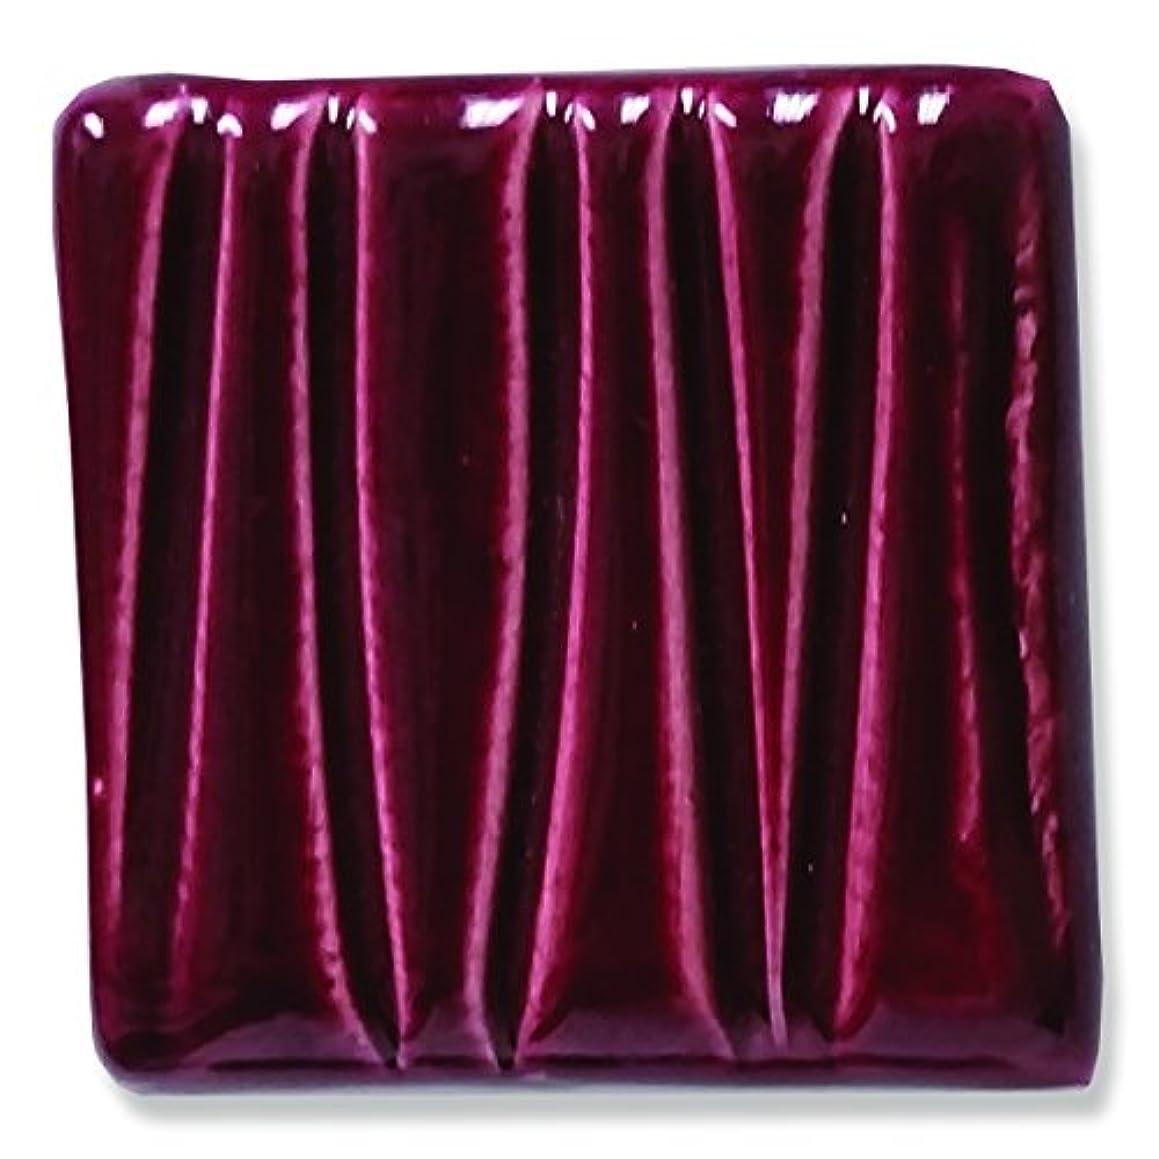 Speedball 004015 Earthenware Glaze, Burgundy, 16 oz